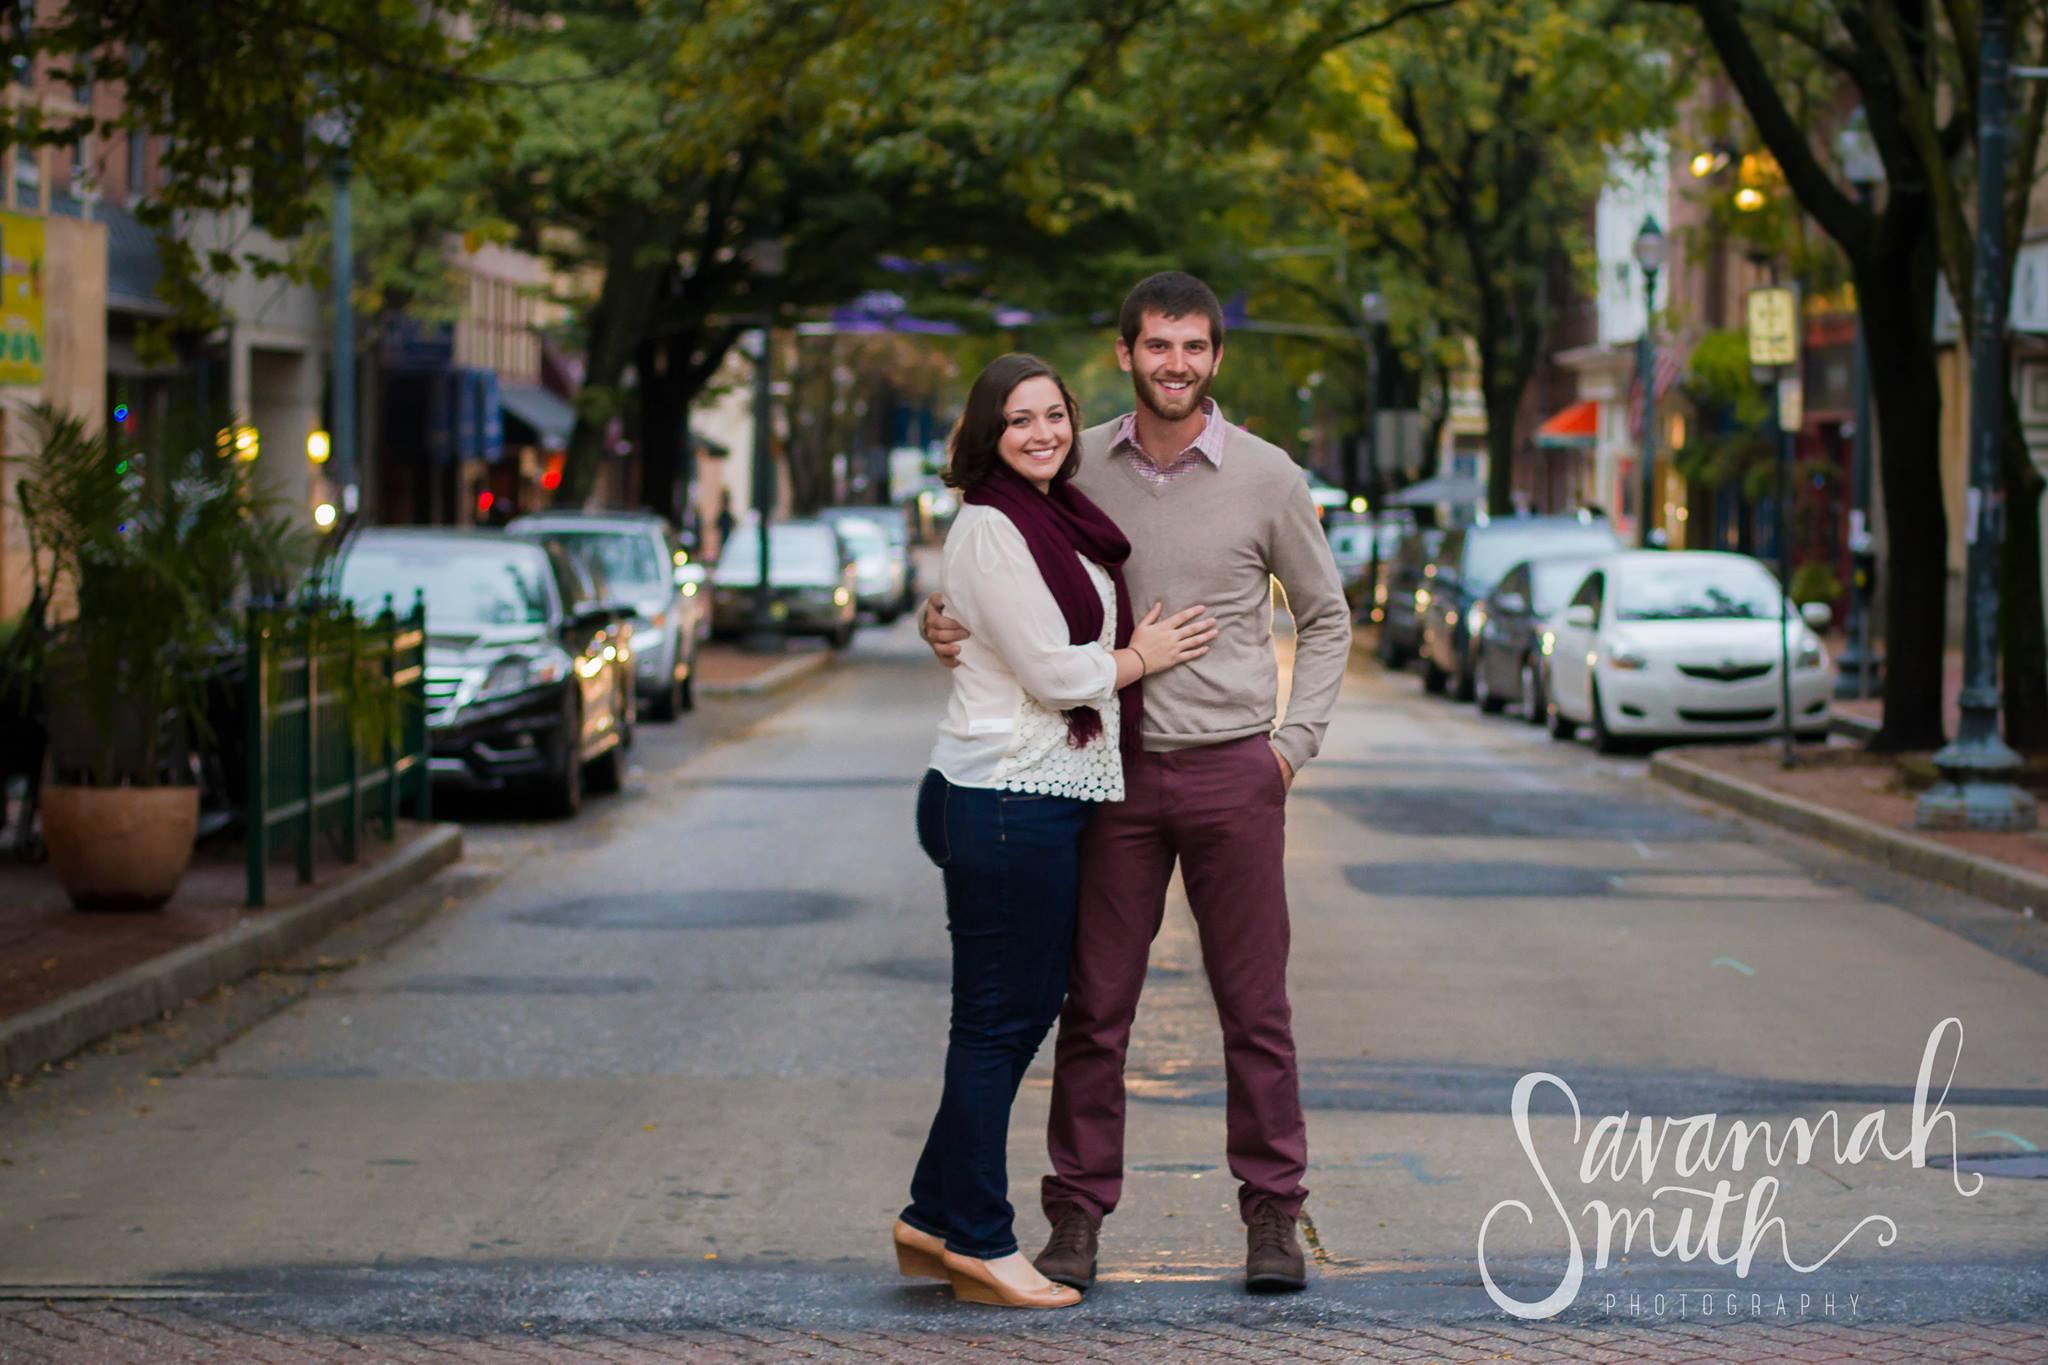 Savannah Smith Photography - Stevie & Anthony